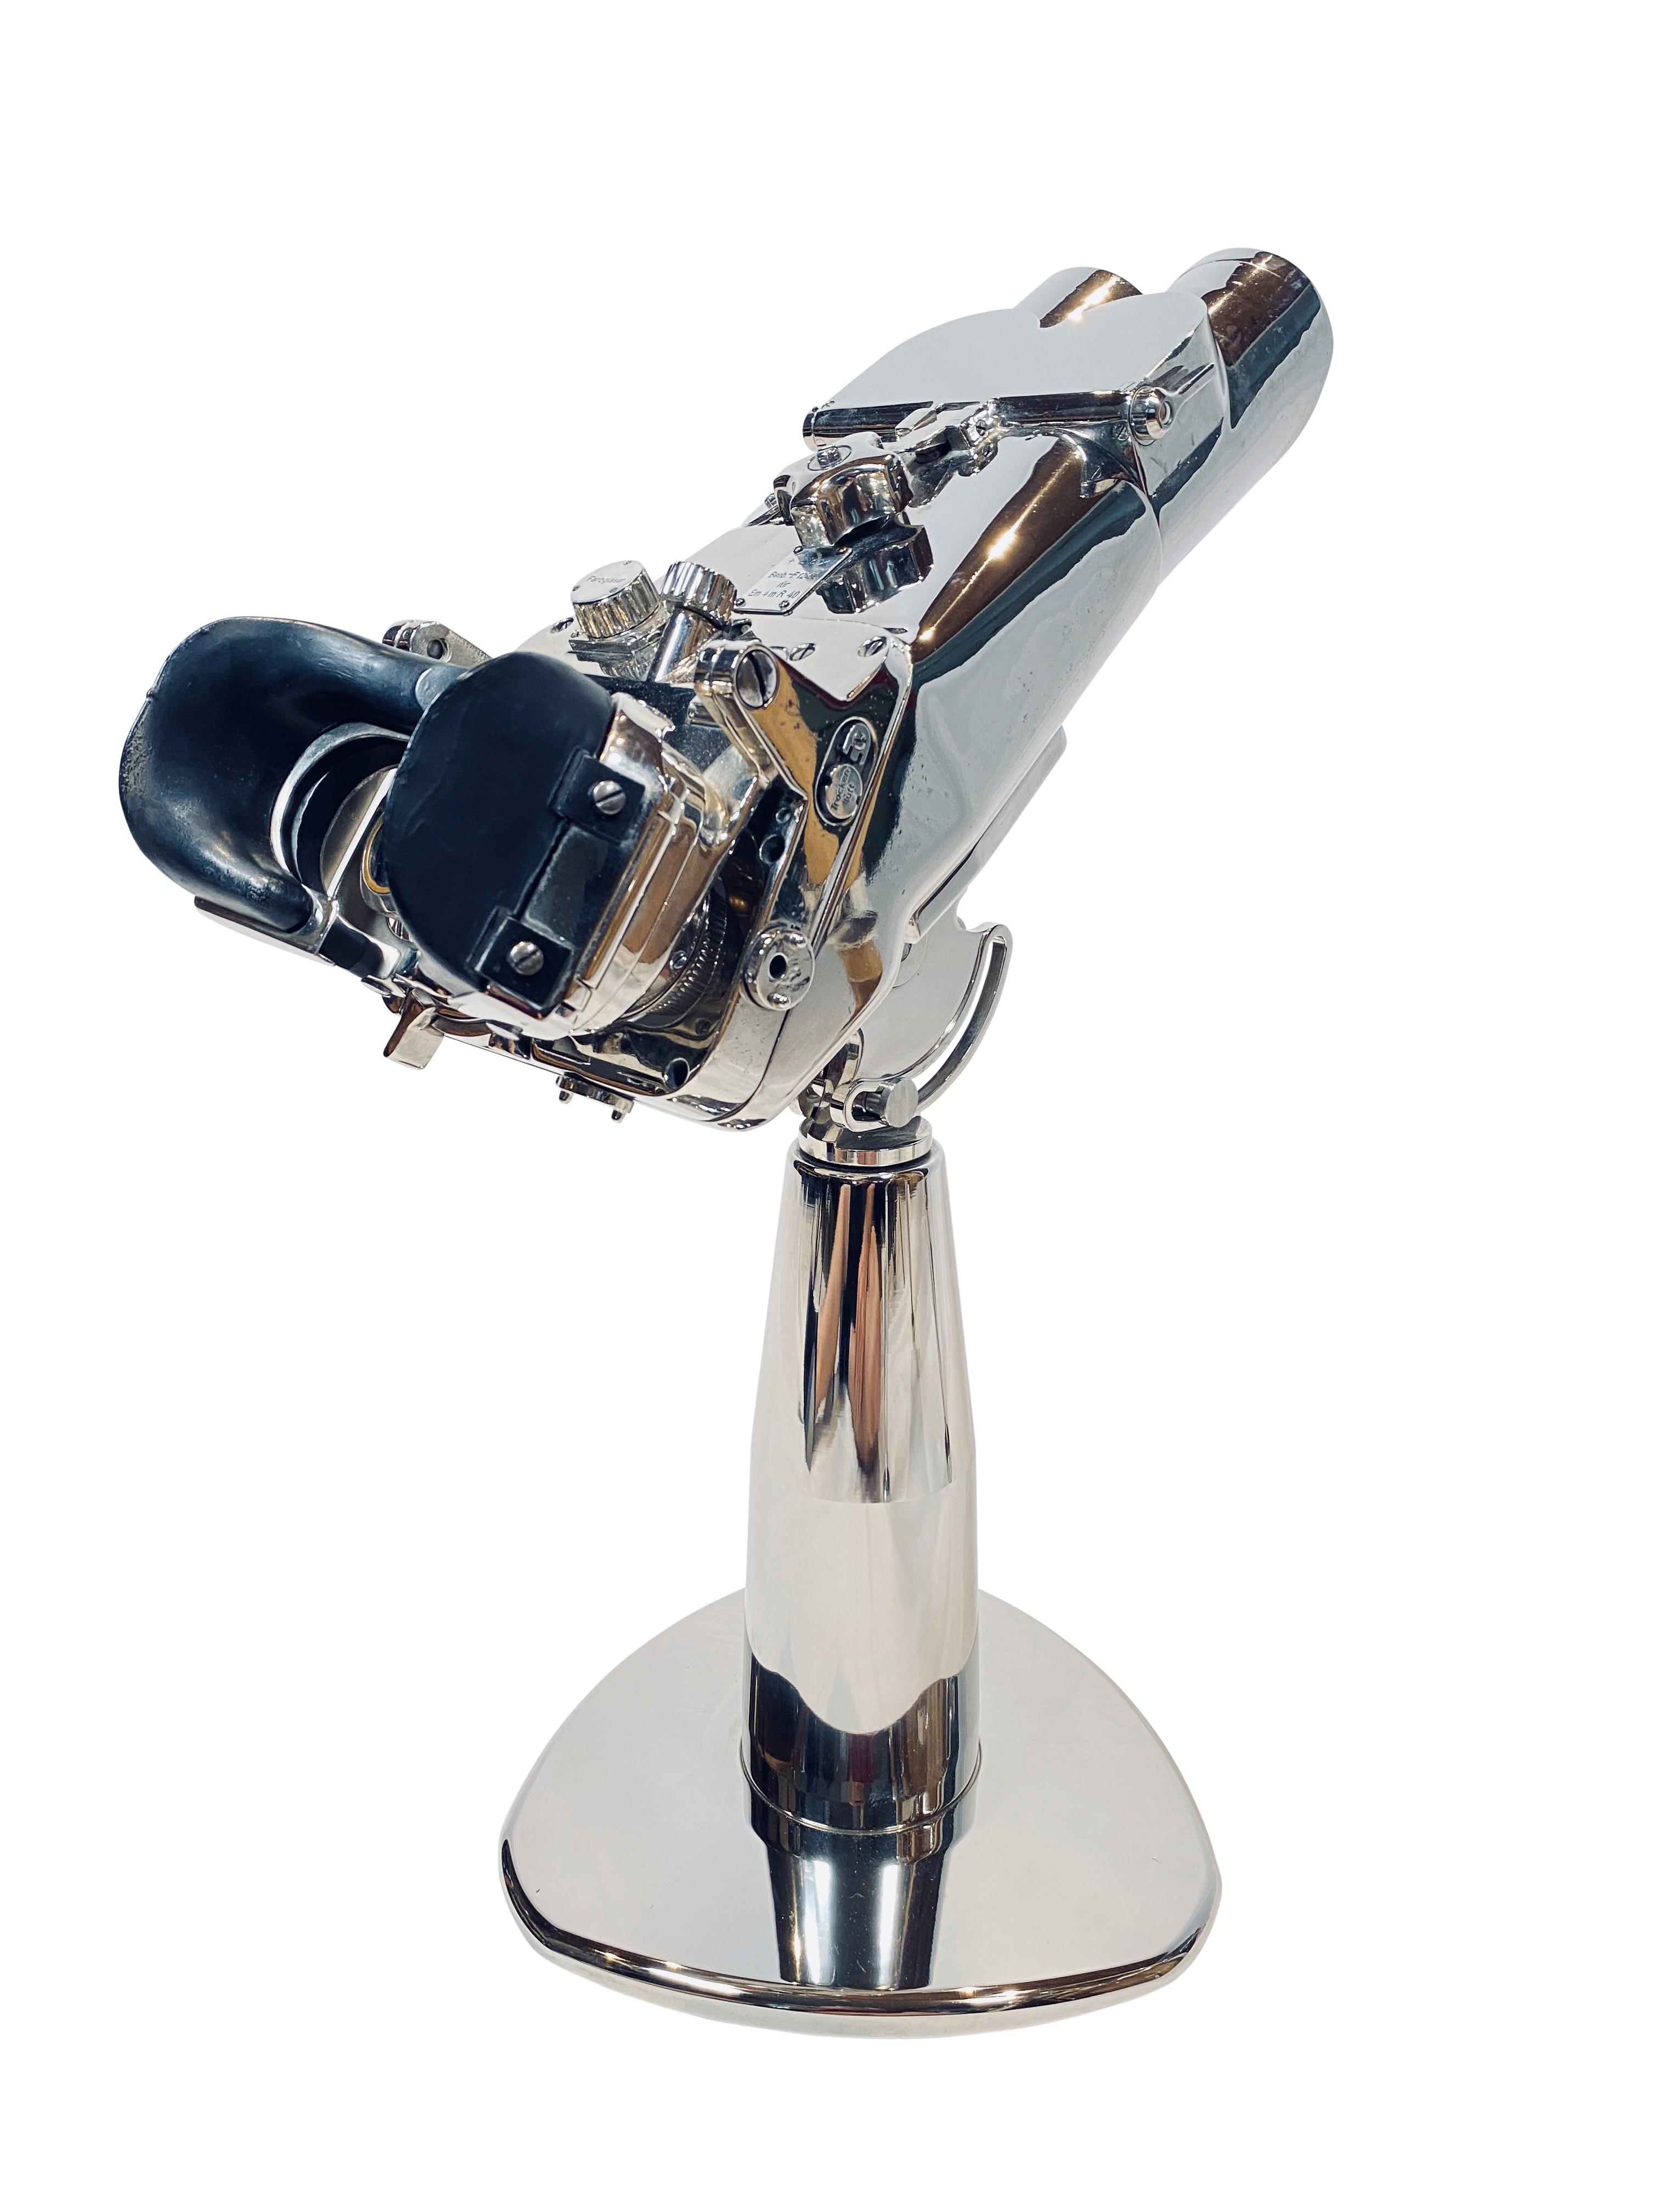 12x60 Flak Binocular